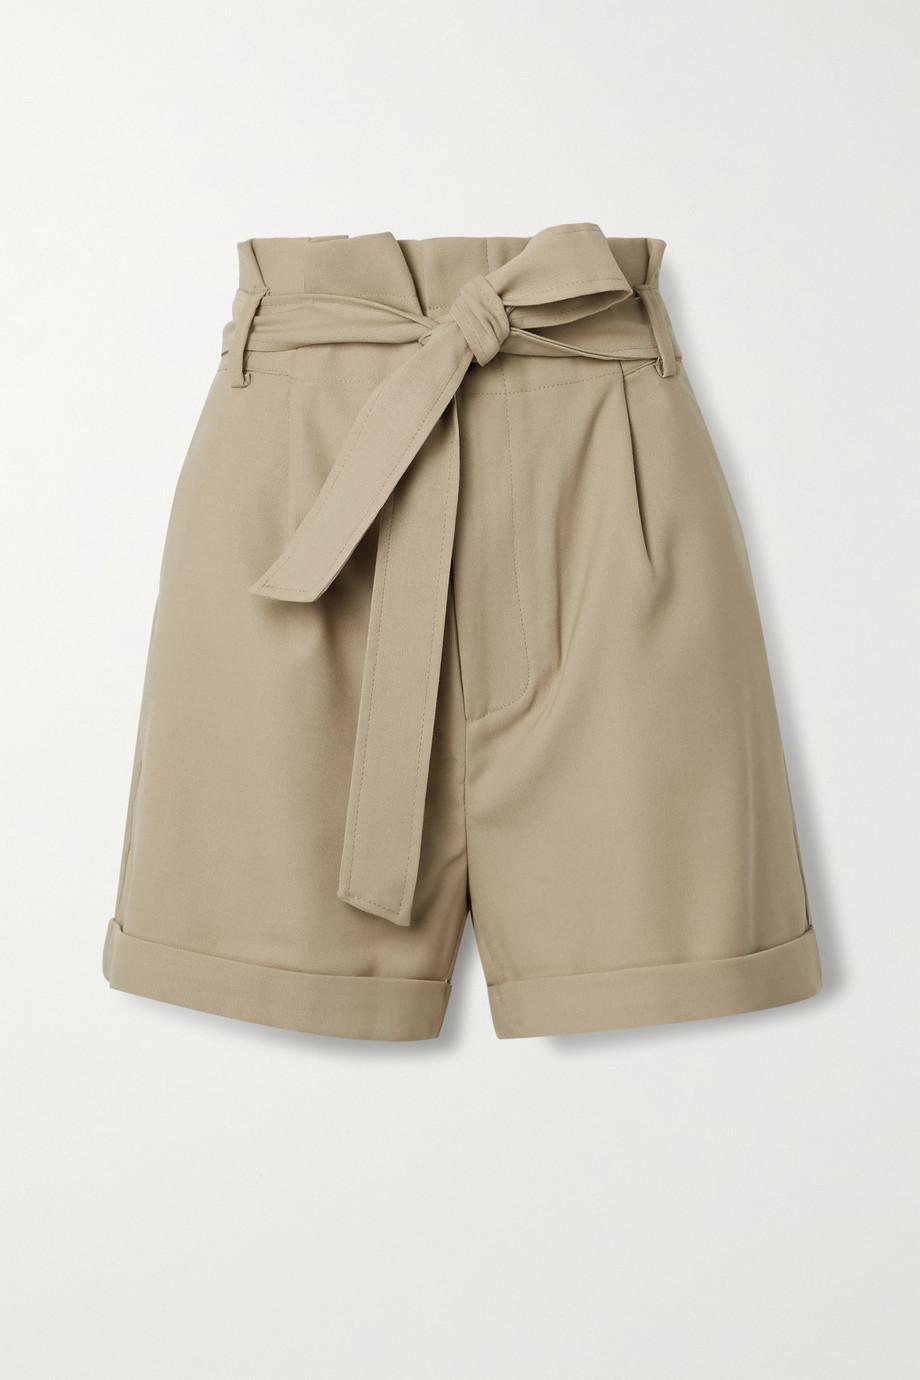 Anine Bing Kinsley 配腰带粒纹面料短裤